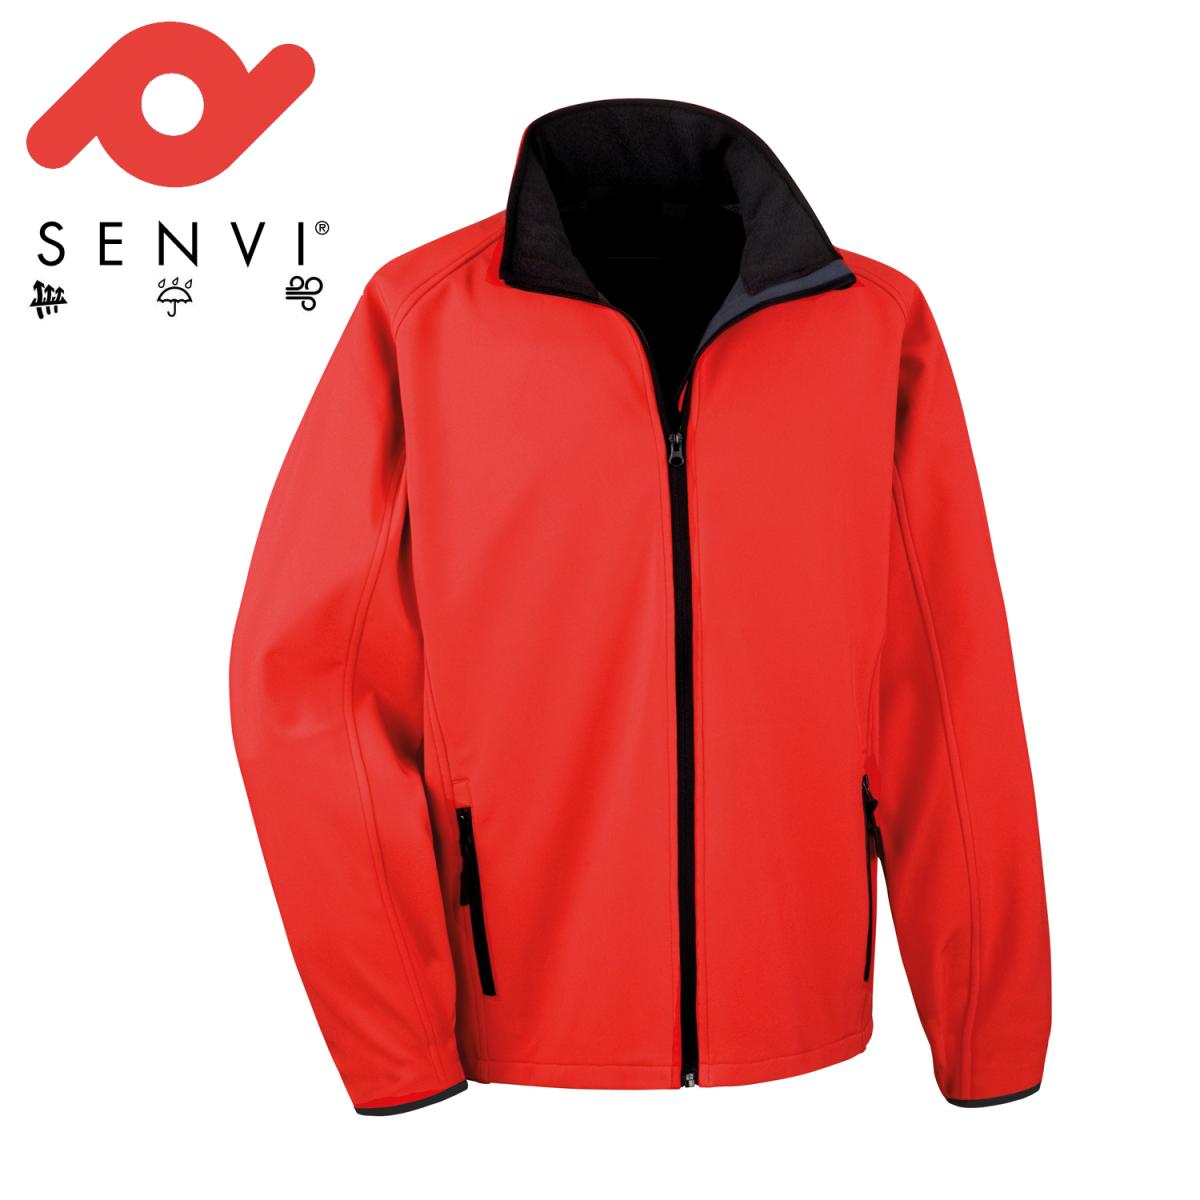 Senvi Softshell Jas - Kleur Rood//Zwart- Maat S